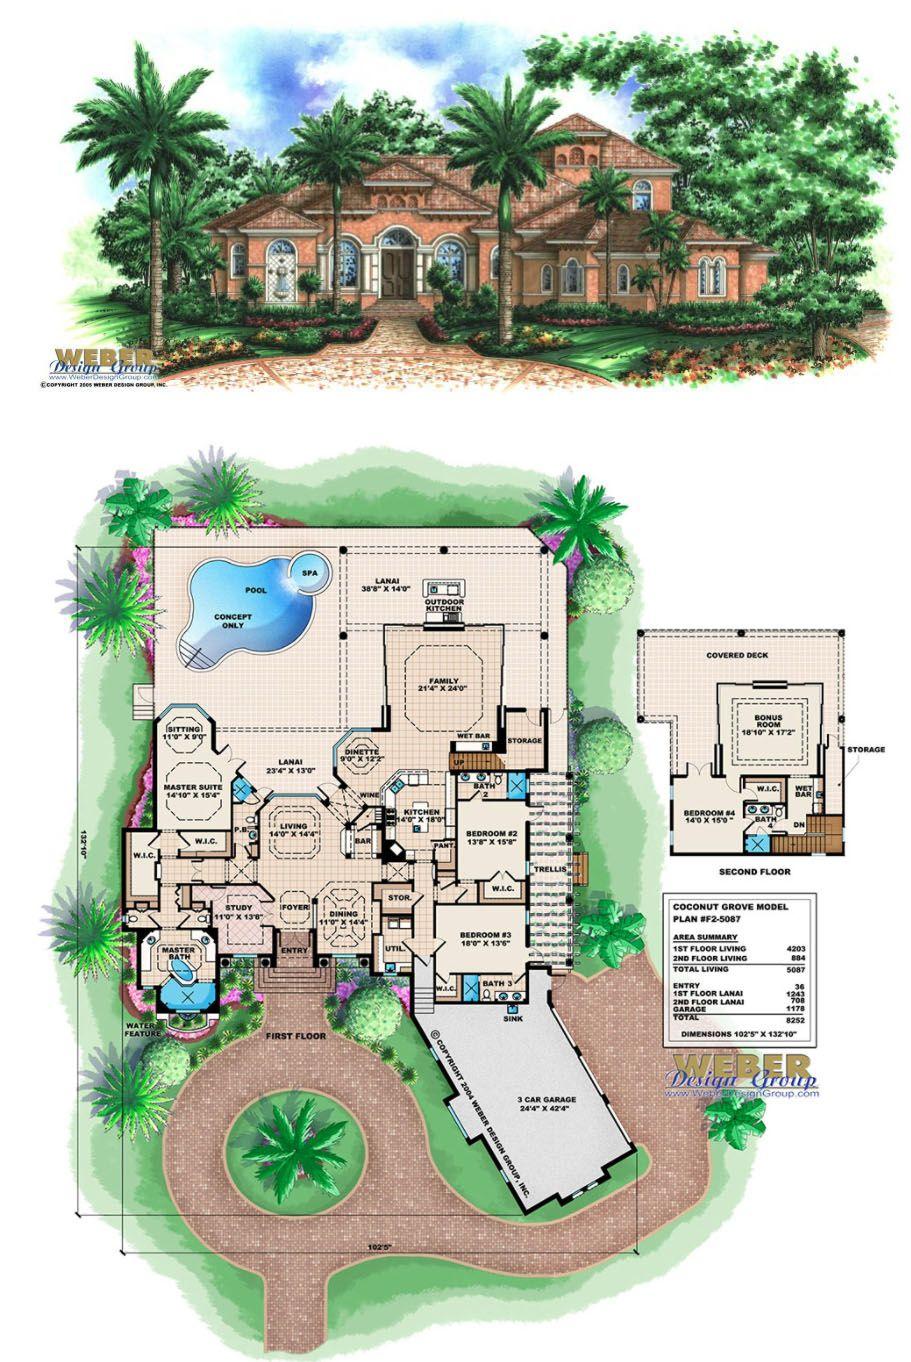 Tuscan House Plan Coastal Mediterranean Style Golf Course Home Plan Mediterranean Homes House Plans Tuscan House Plans